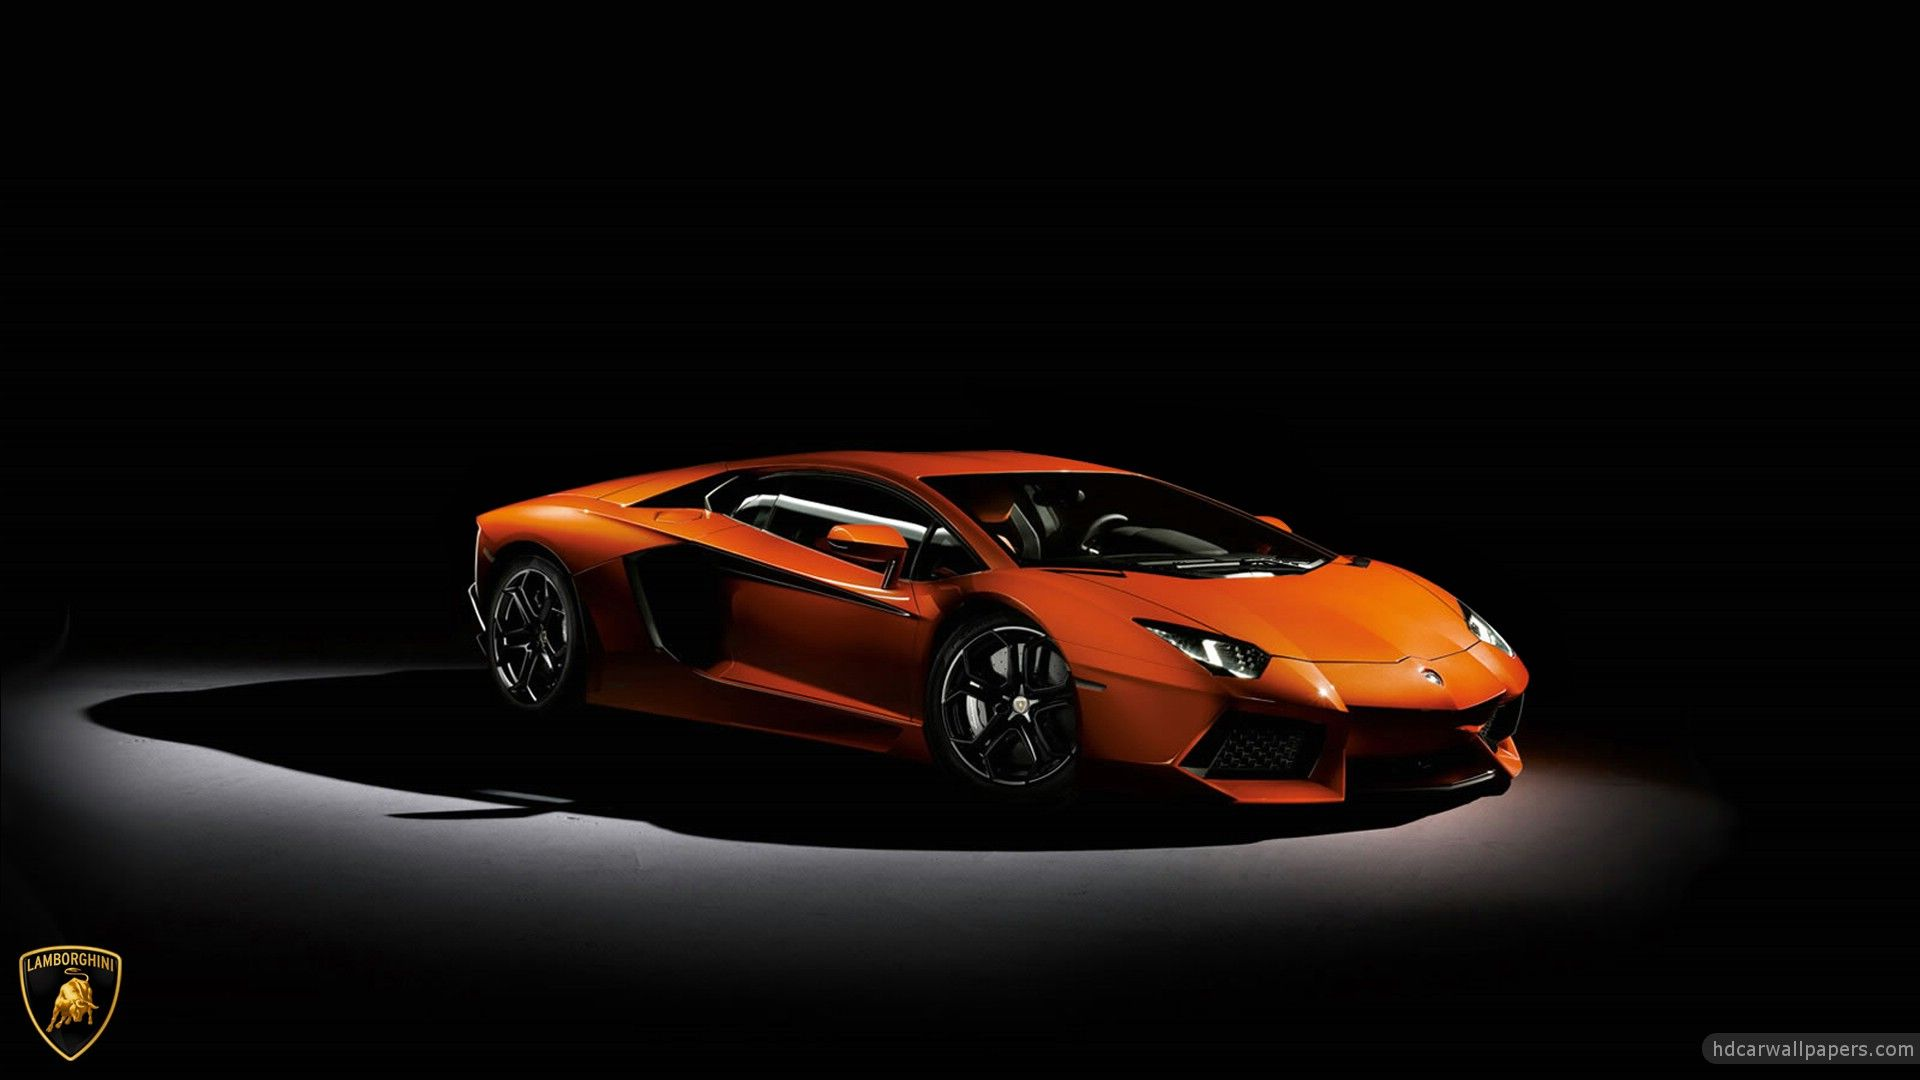 Thanks For Sharing This Post Widescreen Lamborghini Car Hd Wallpaper Lexus Lfa Racing Car Hd Wallpapers